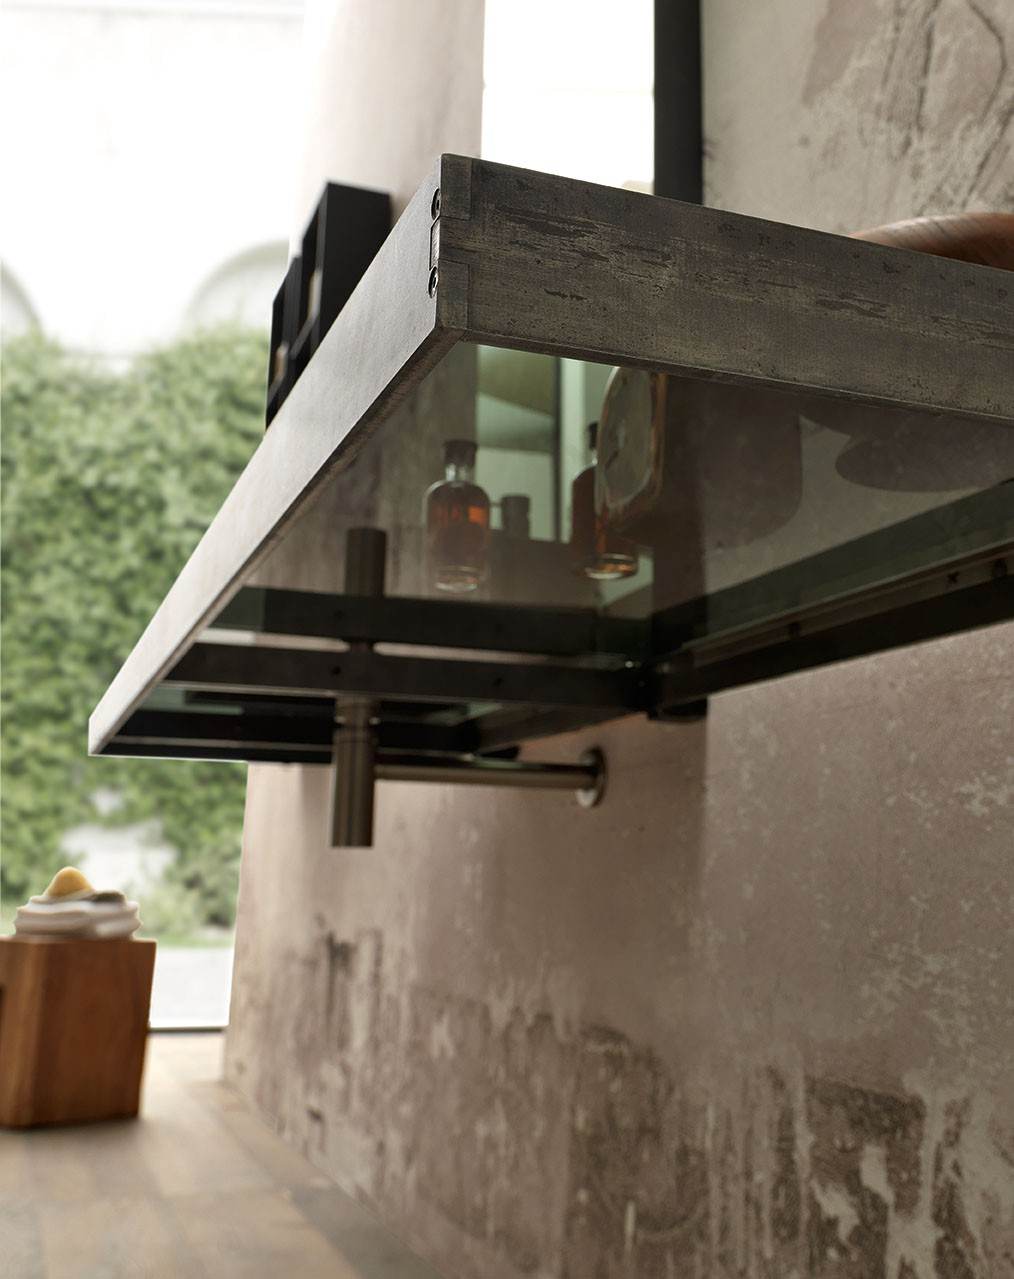 Meuble De Salle De Bain Design En Mtal Vieilli Et Verre